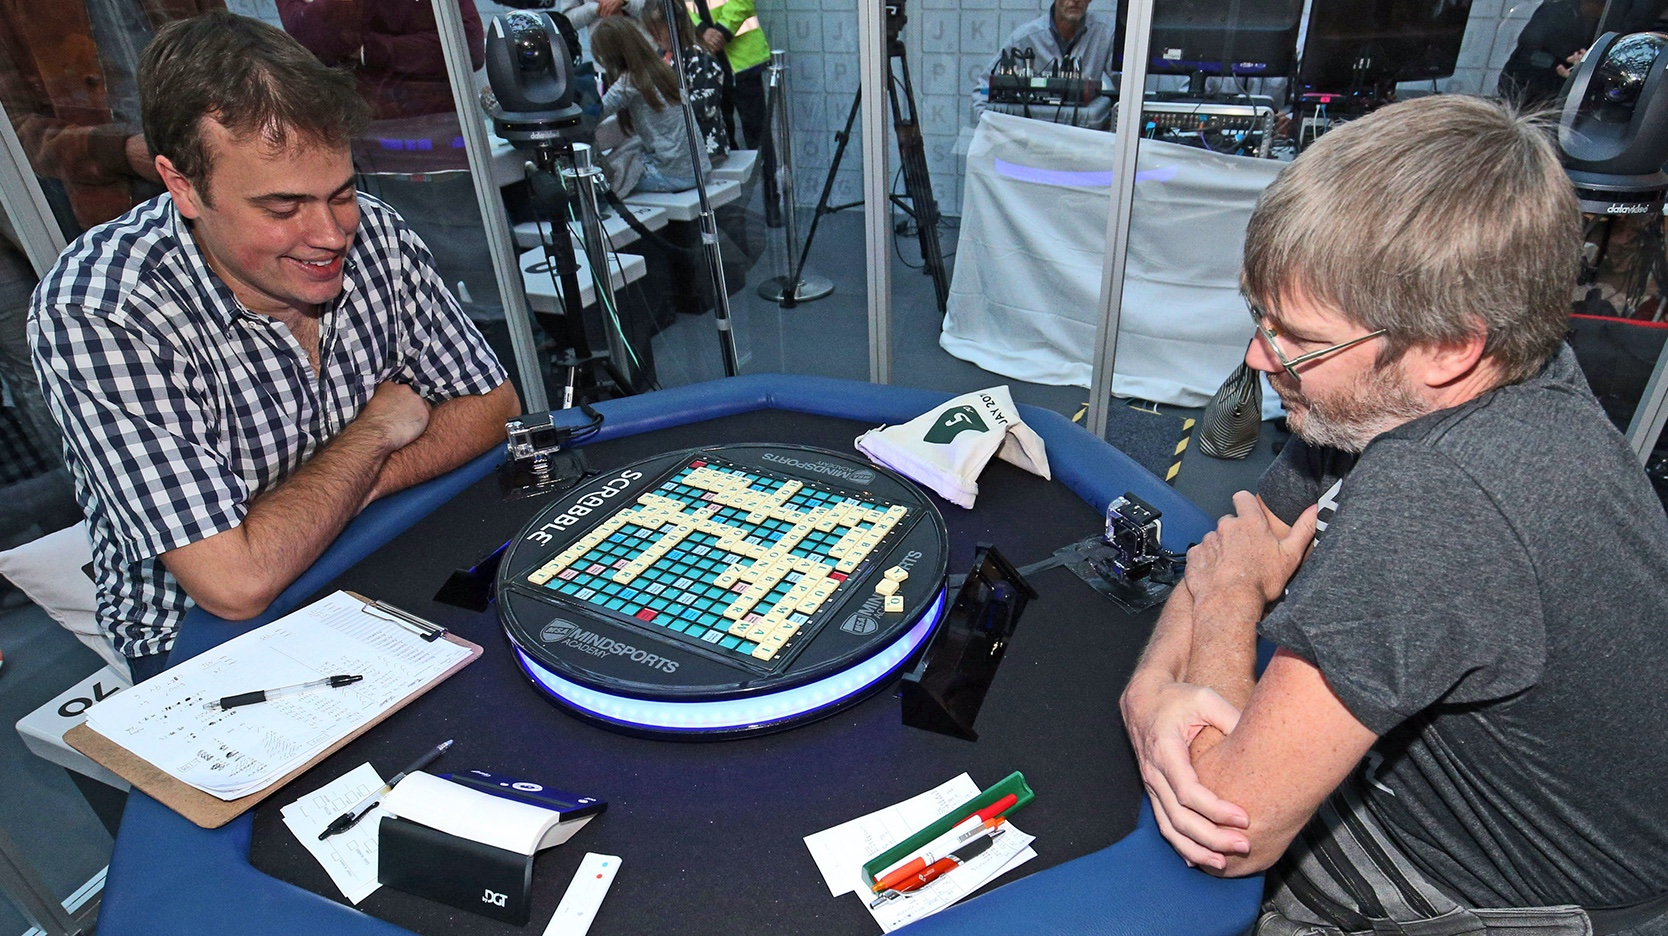 Nigel Richards Scrabble World Championship 2018